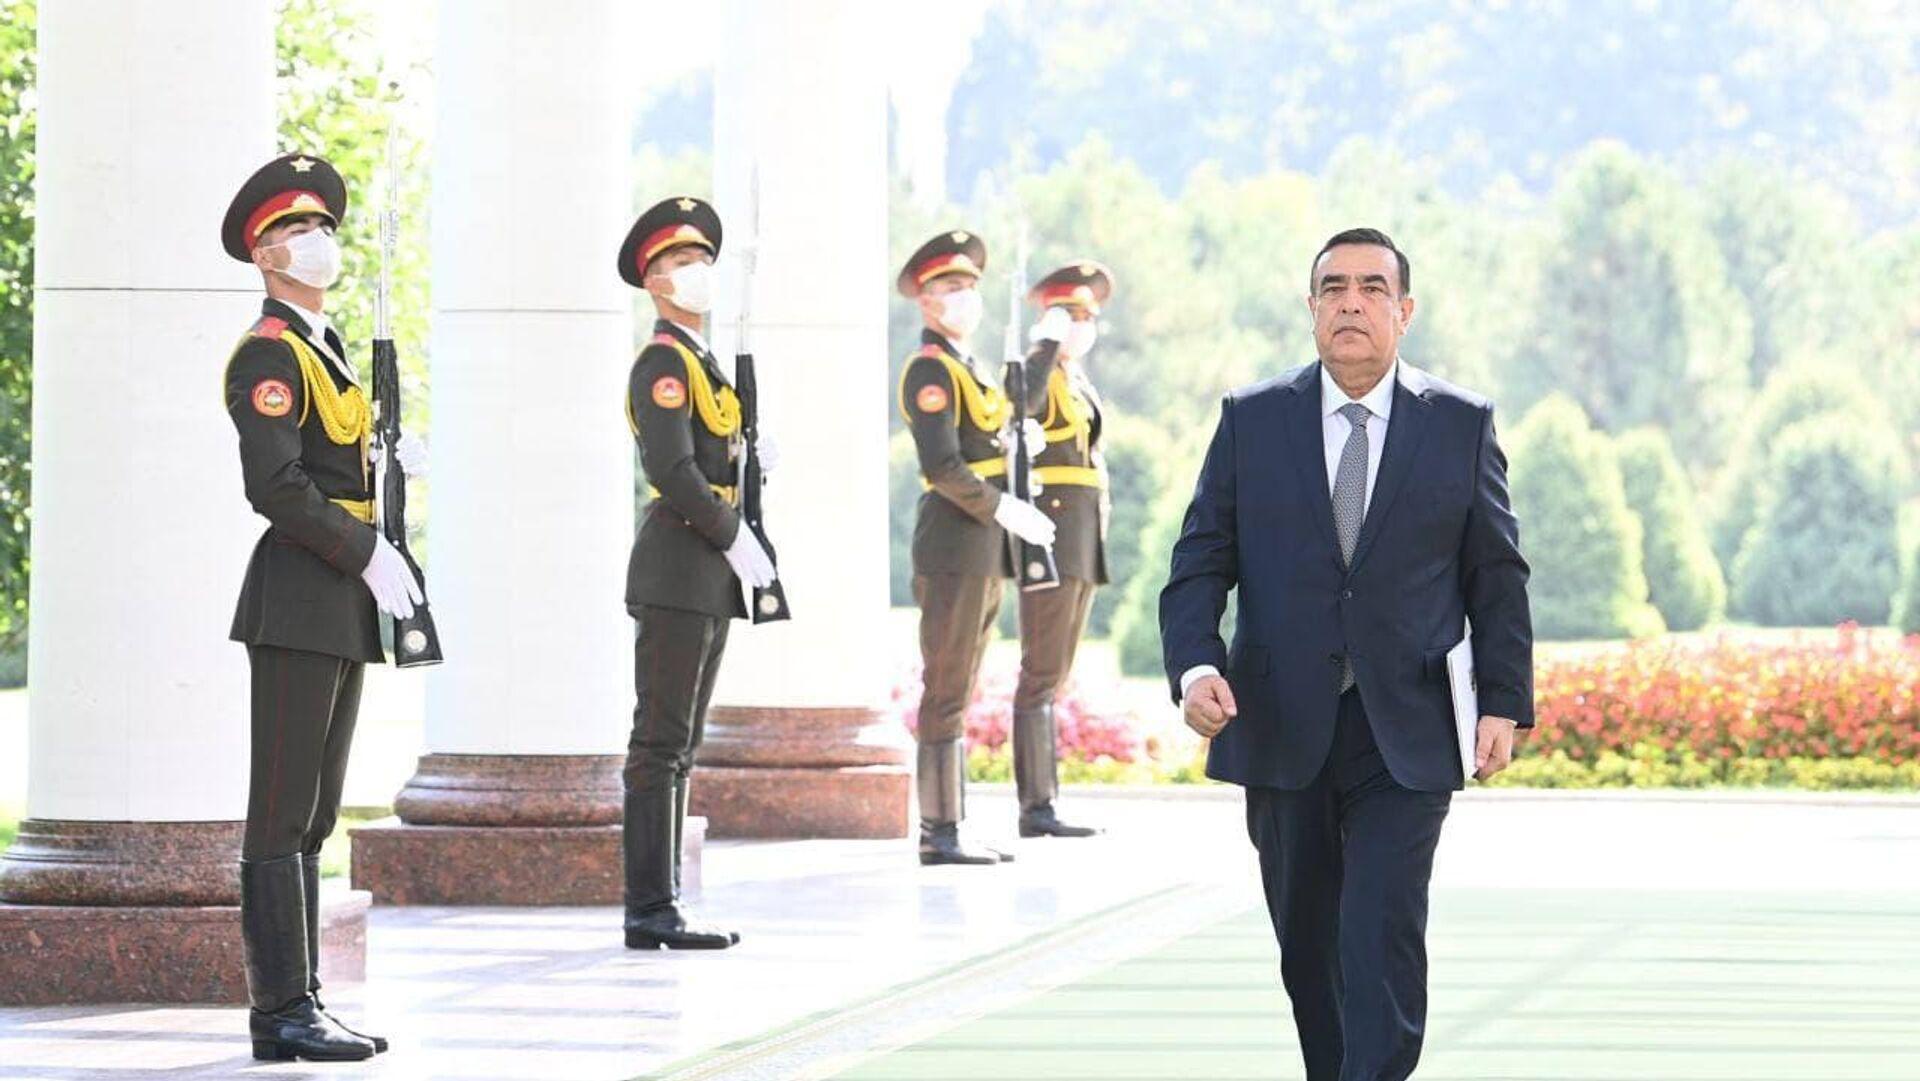 Президент Узбекистана принял посла Республики Таджикистан Абдужаббора Рахмонзода - Sputnik Таджикистан, 1920, 25.08.2021